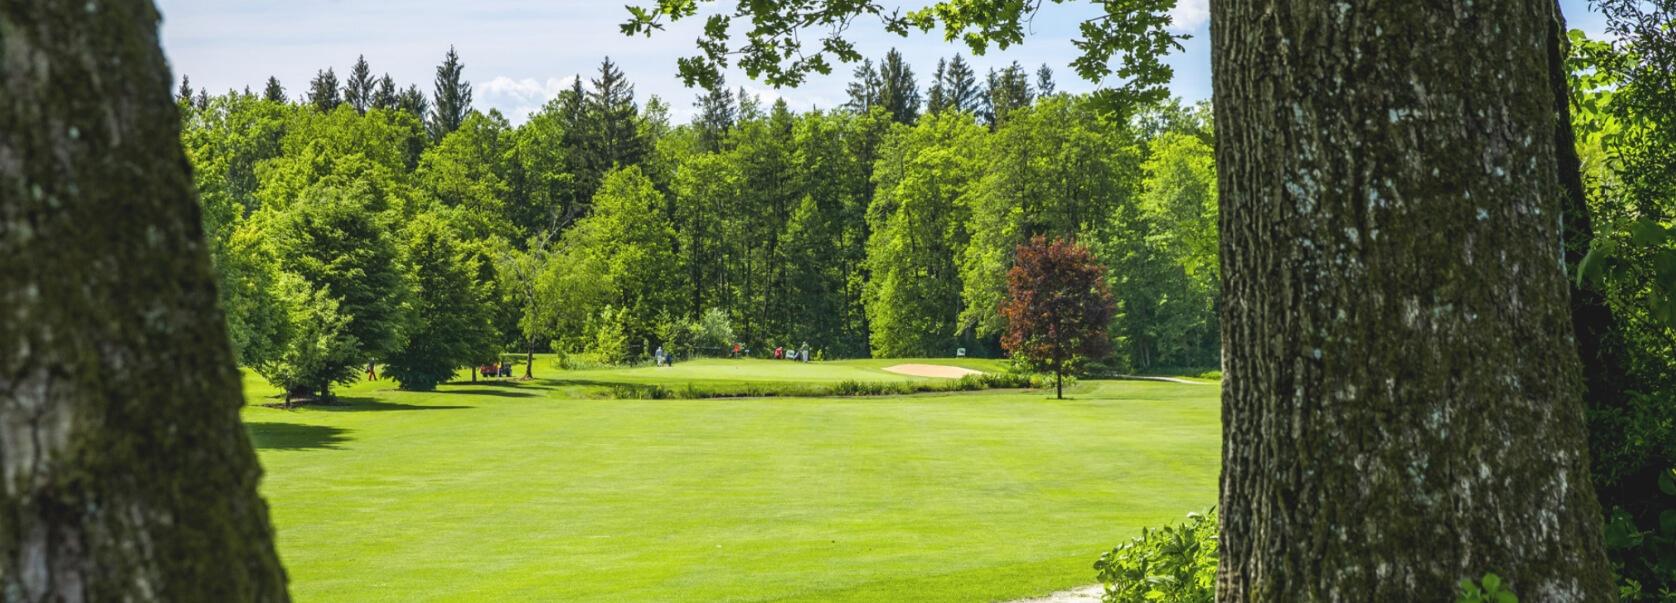 Golffläche Golfclub Beuerberg